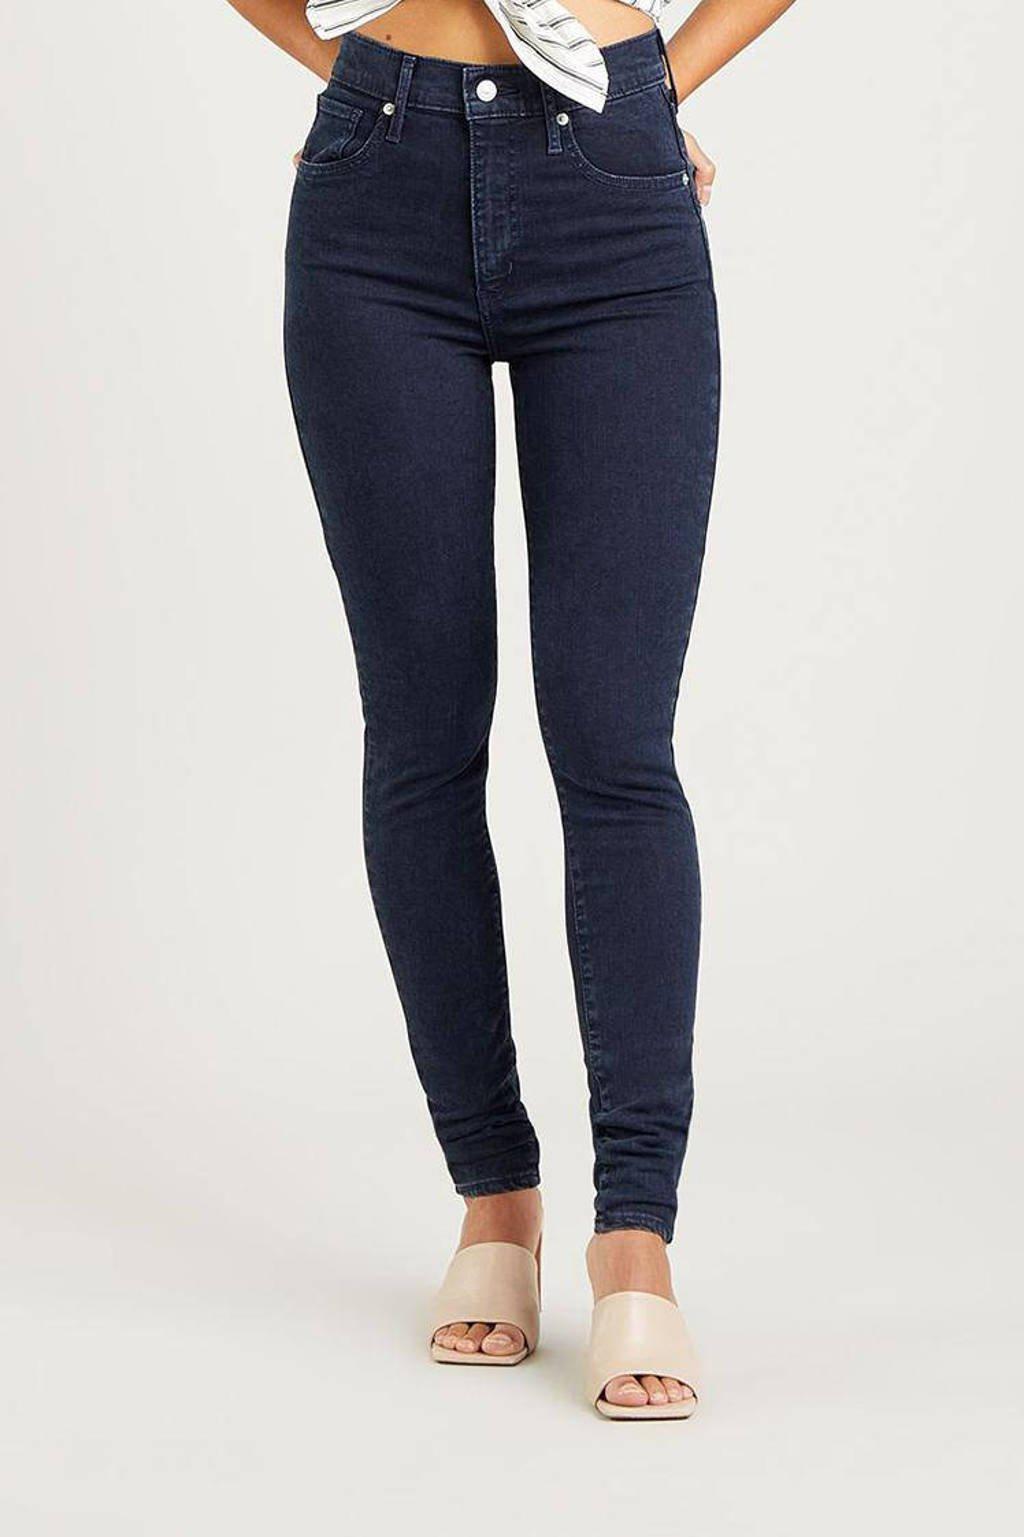 Levi's MILE HIGH SUPER SKINNY high waist skinny jeans dark denim, Dark denim